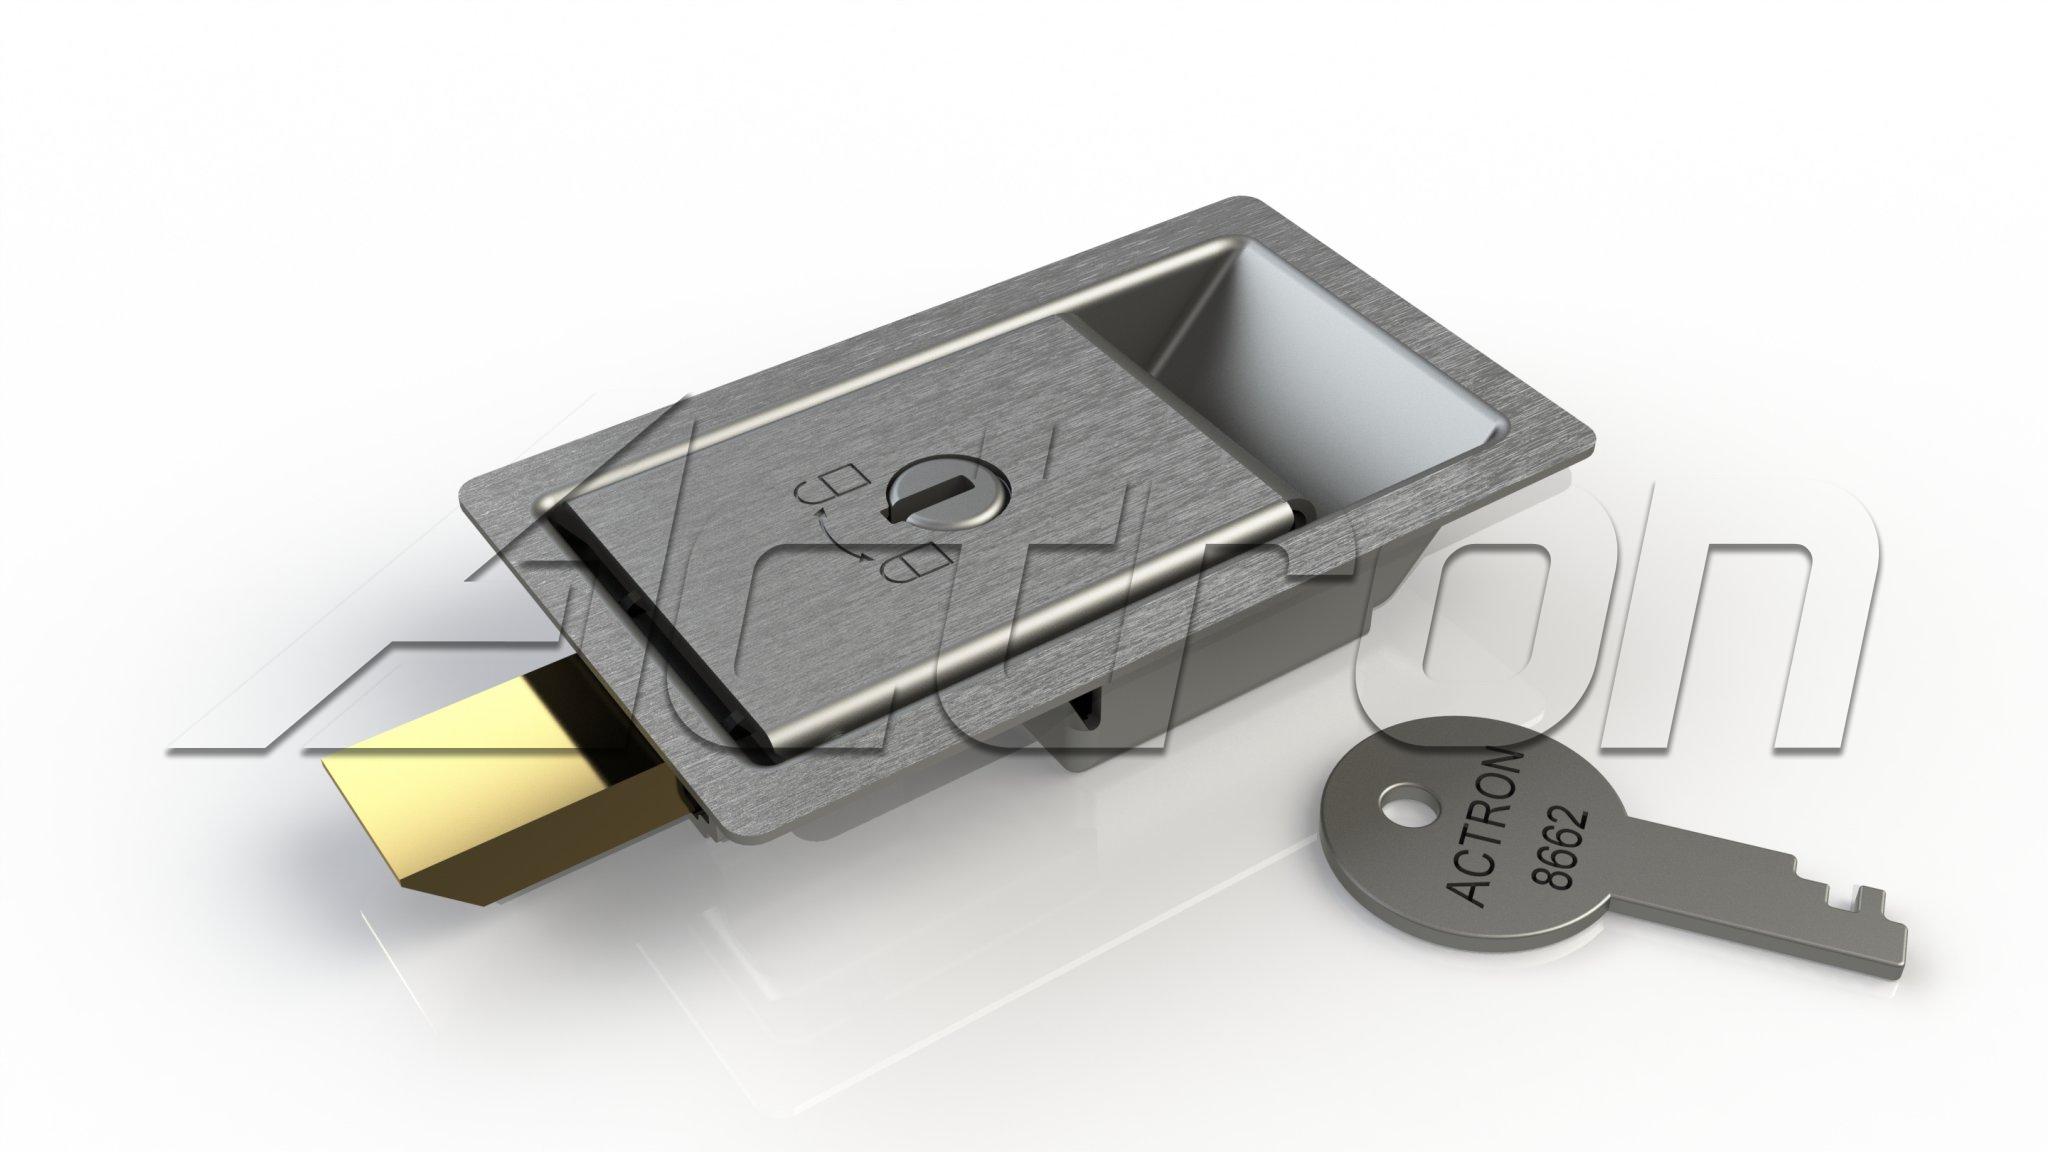 latchlock-assy-8211-paddle-4058-a23019.jpg